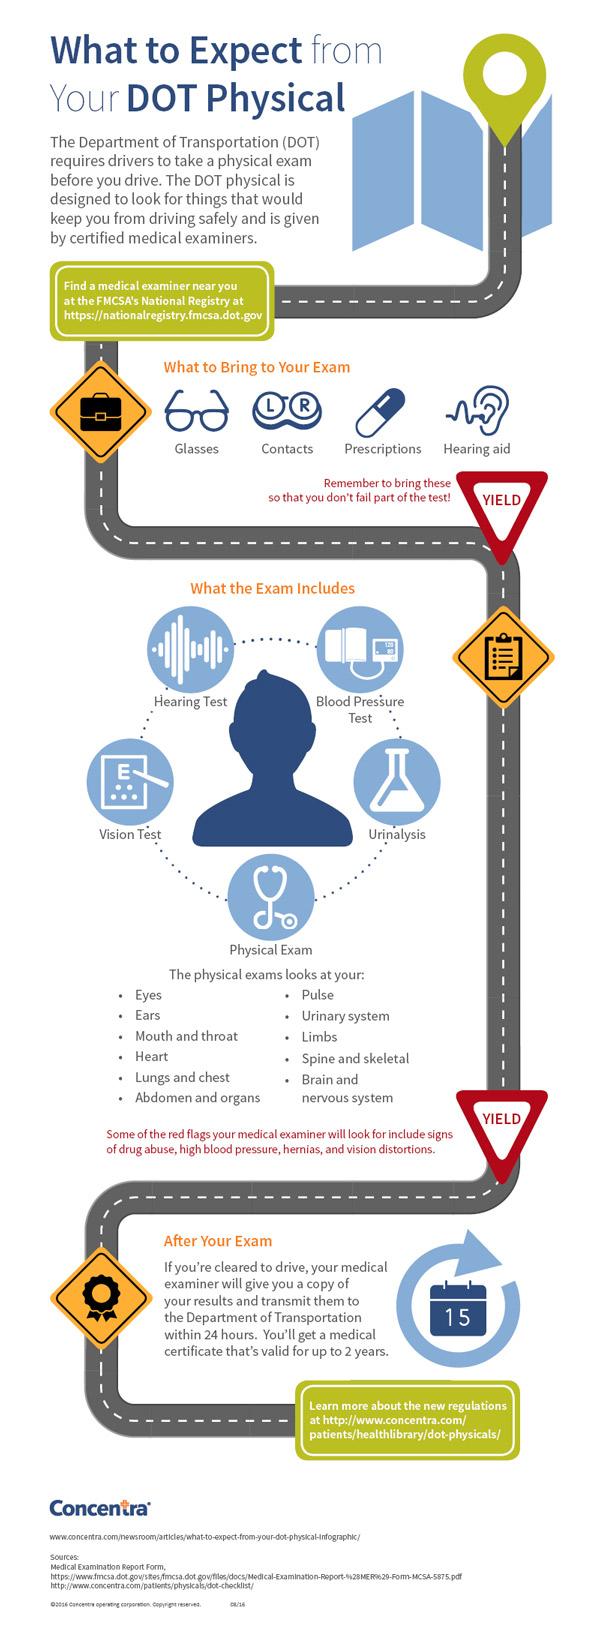 Concentra dot physical occ health infographic finalglaent20170526155517hashf3a48f7dbdba1e4517dff73c59a266ef6b2908b9 concentra dot physical occ health infographic final 1betcityfo Images